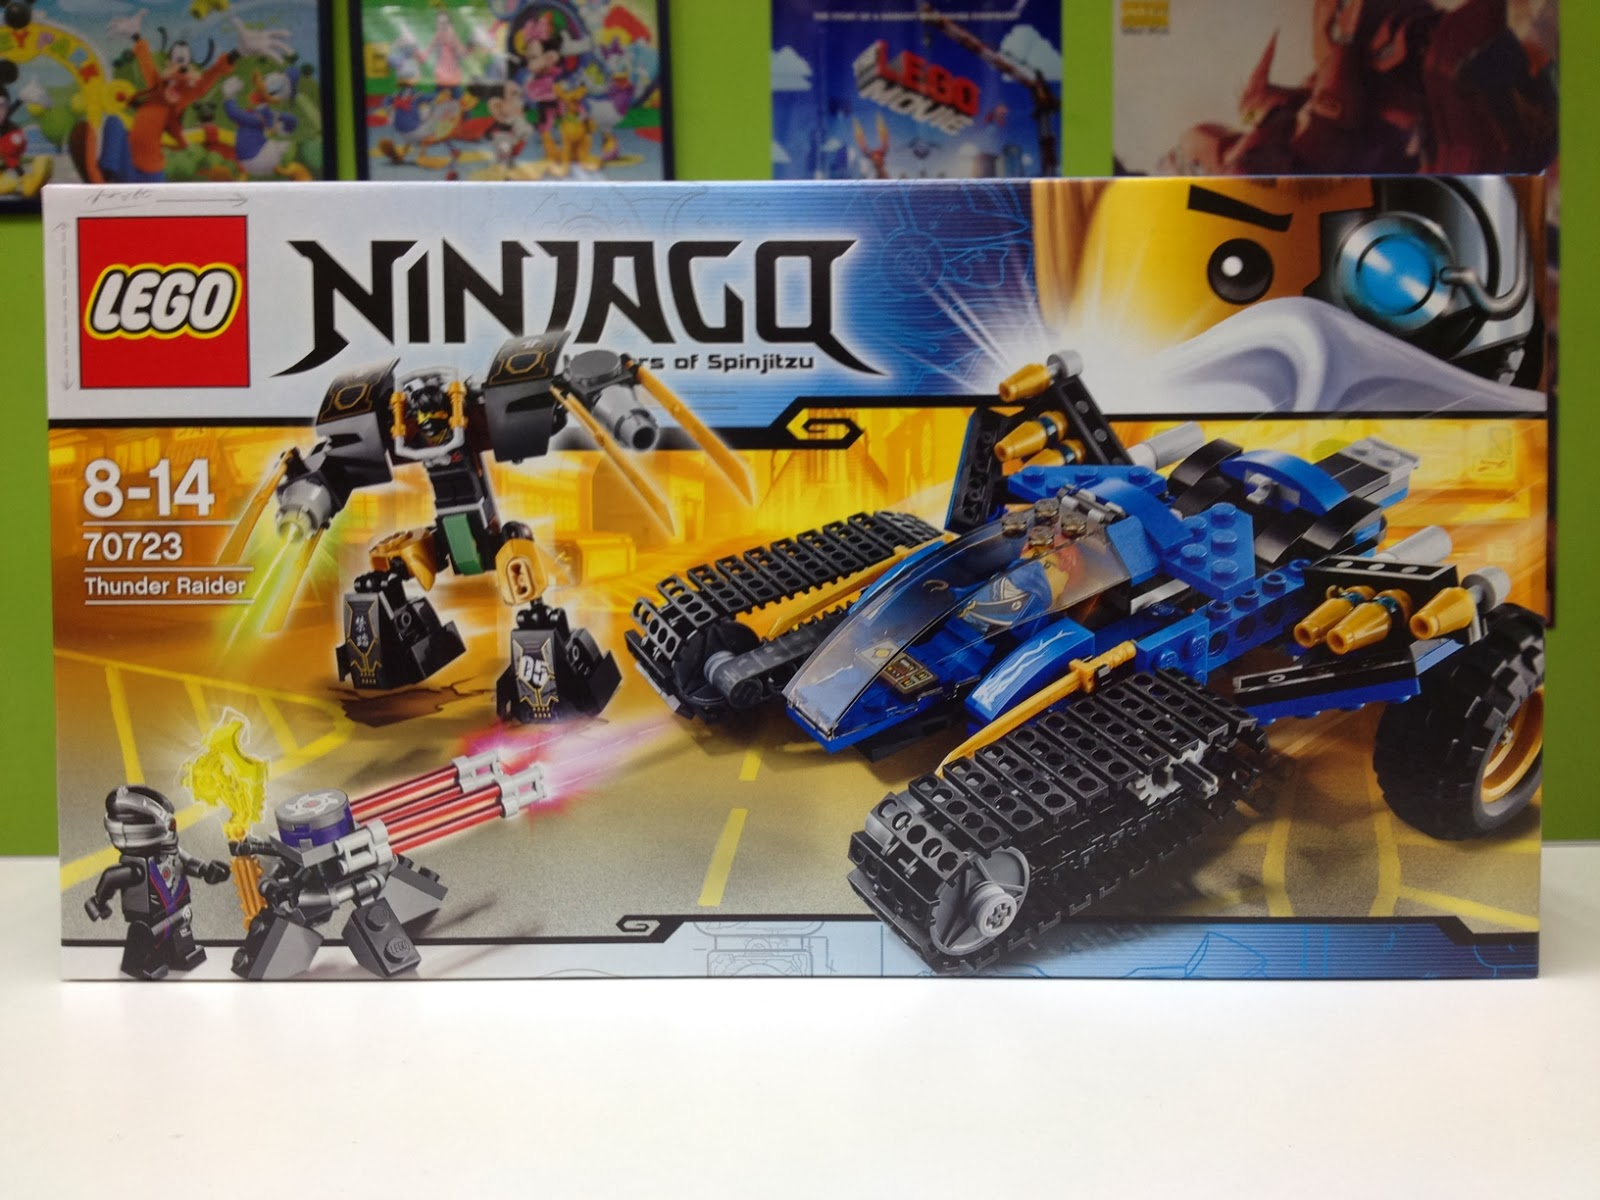 DeToyz Shop: 2014 Lego Ninjago Sets restocked.